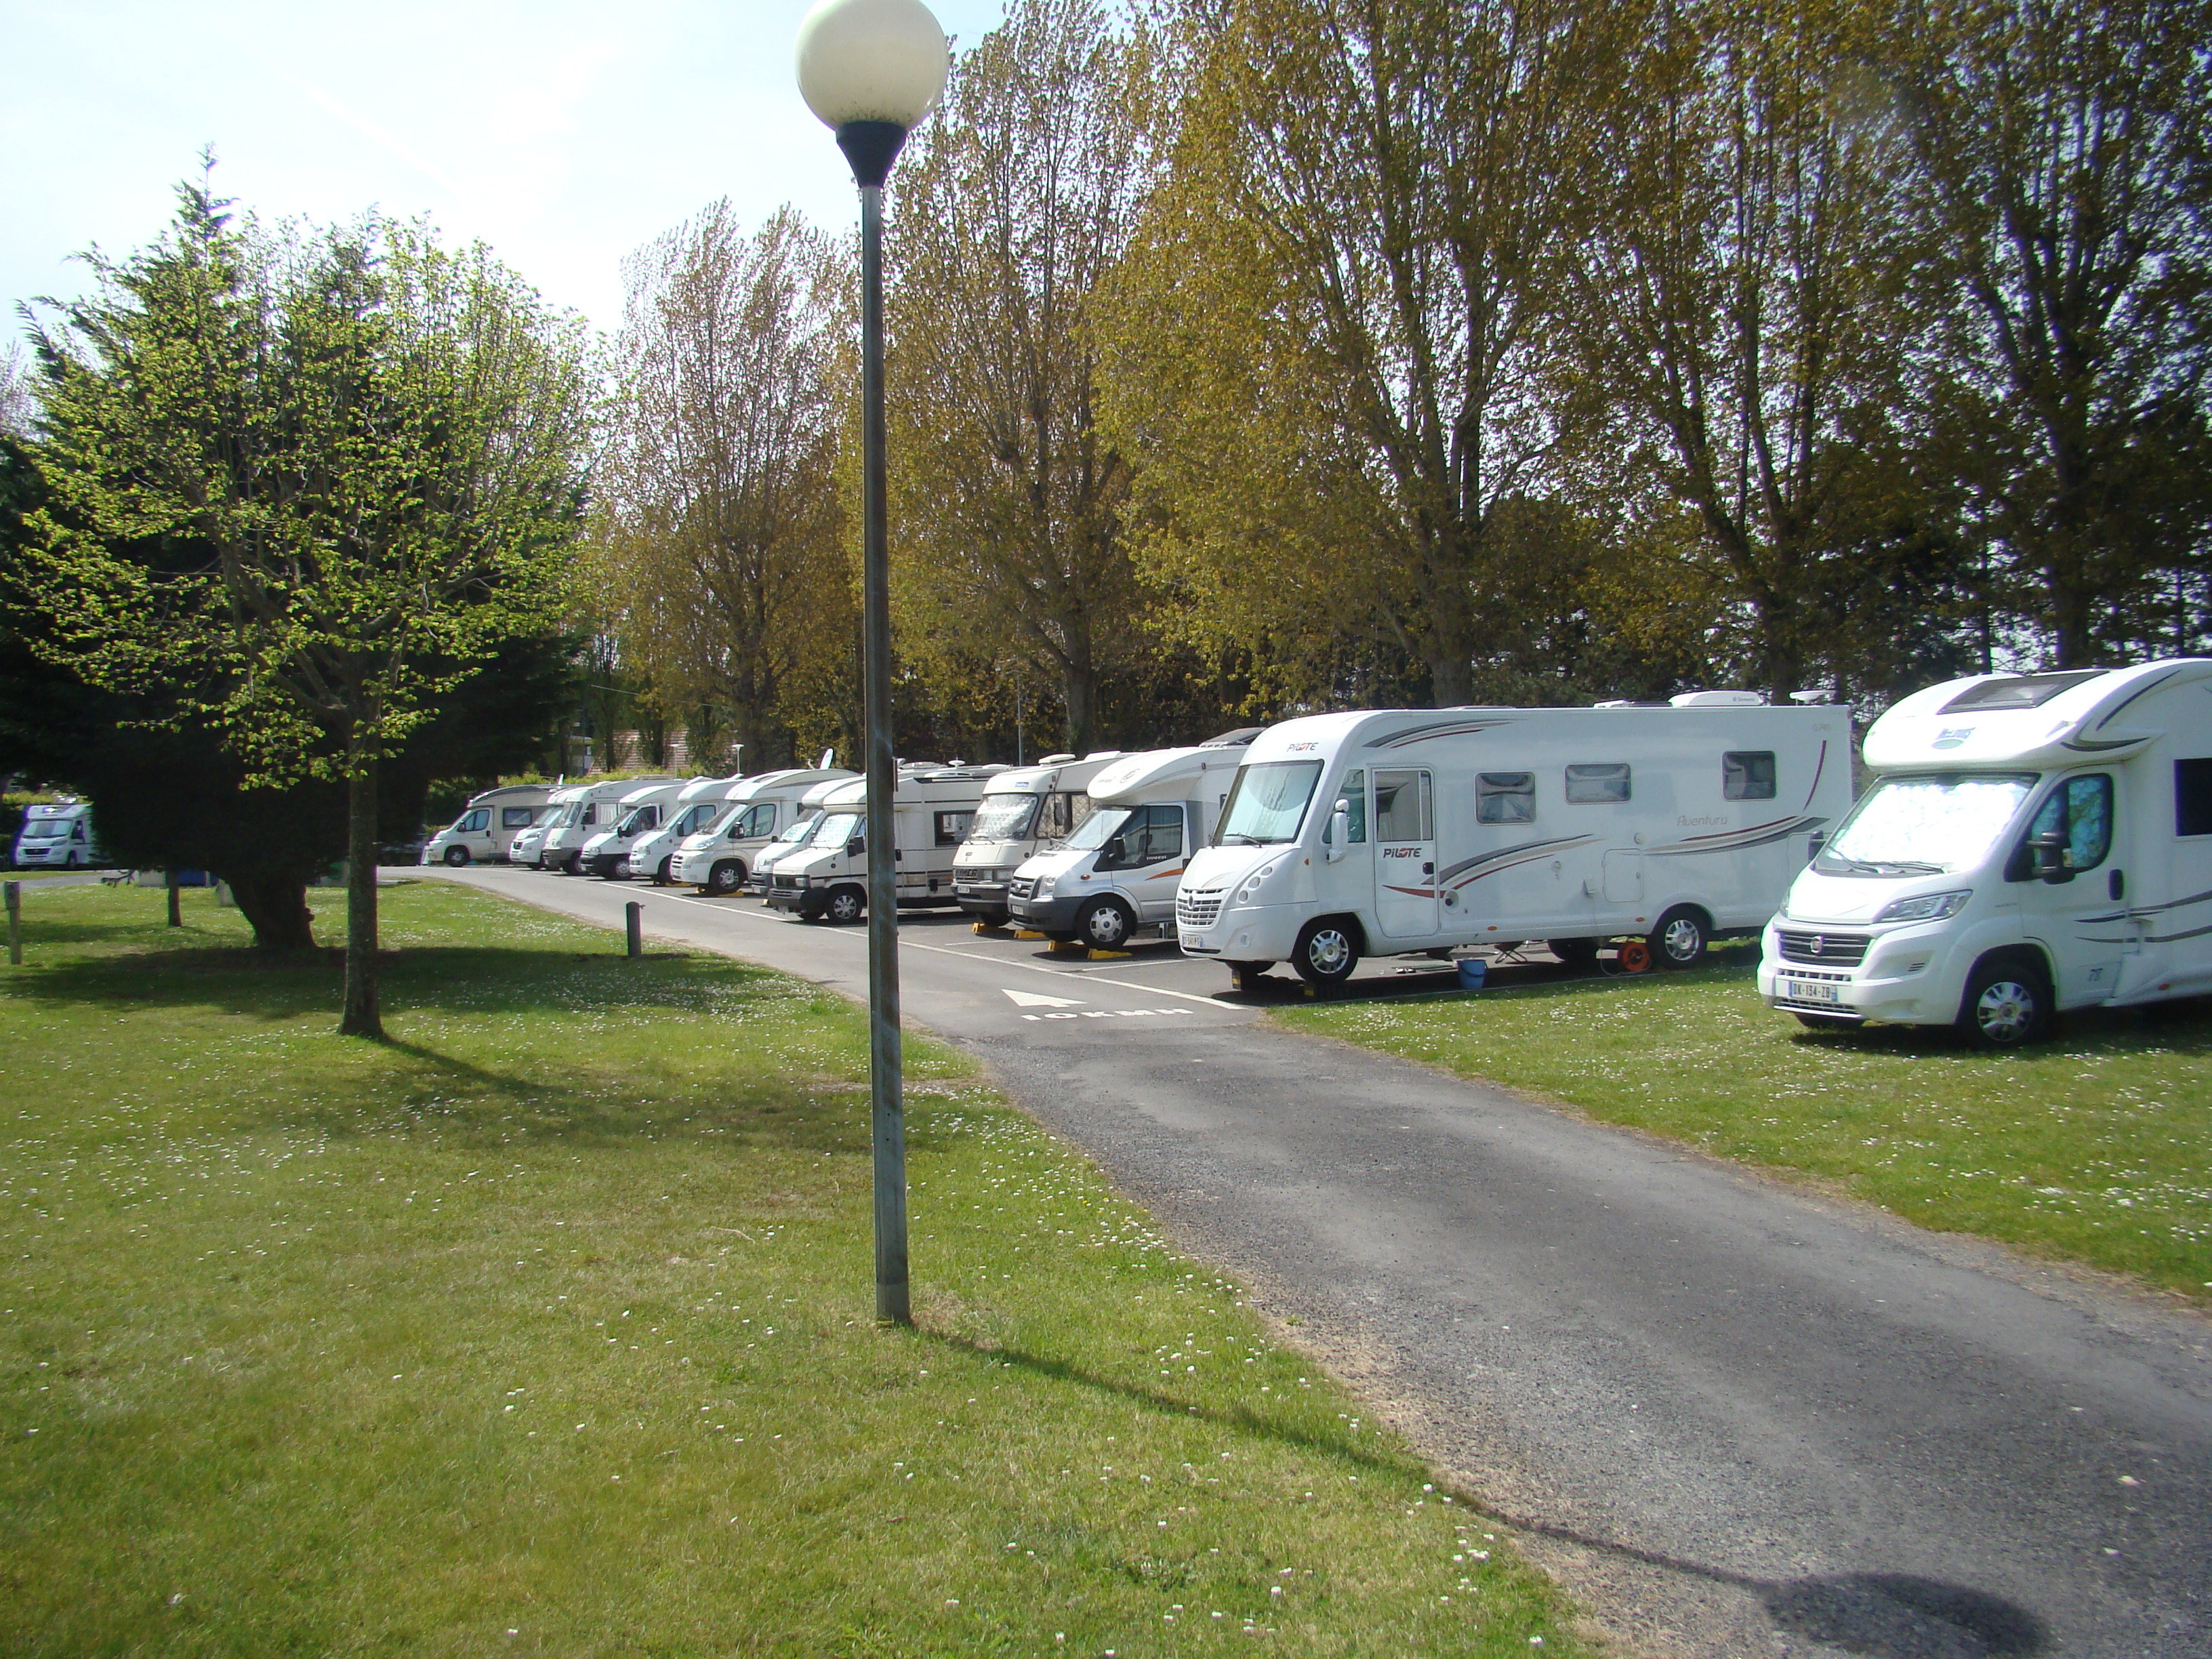 Camping rivabella ouistreham normandie piscine chauff e for Camping en alsace avec piscine